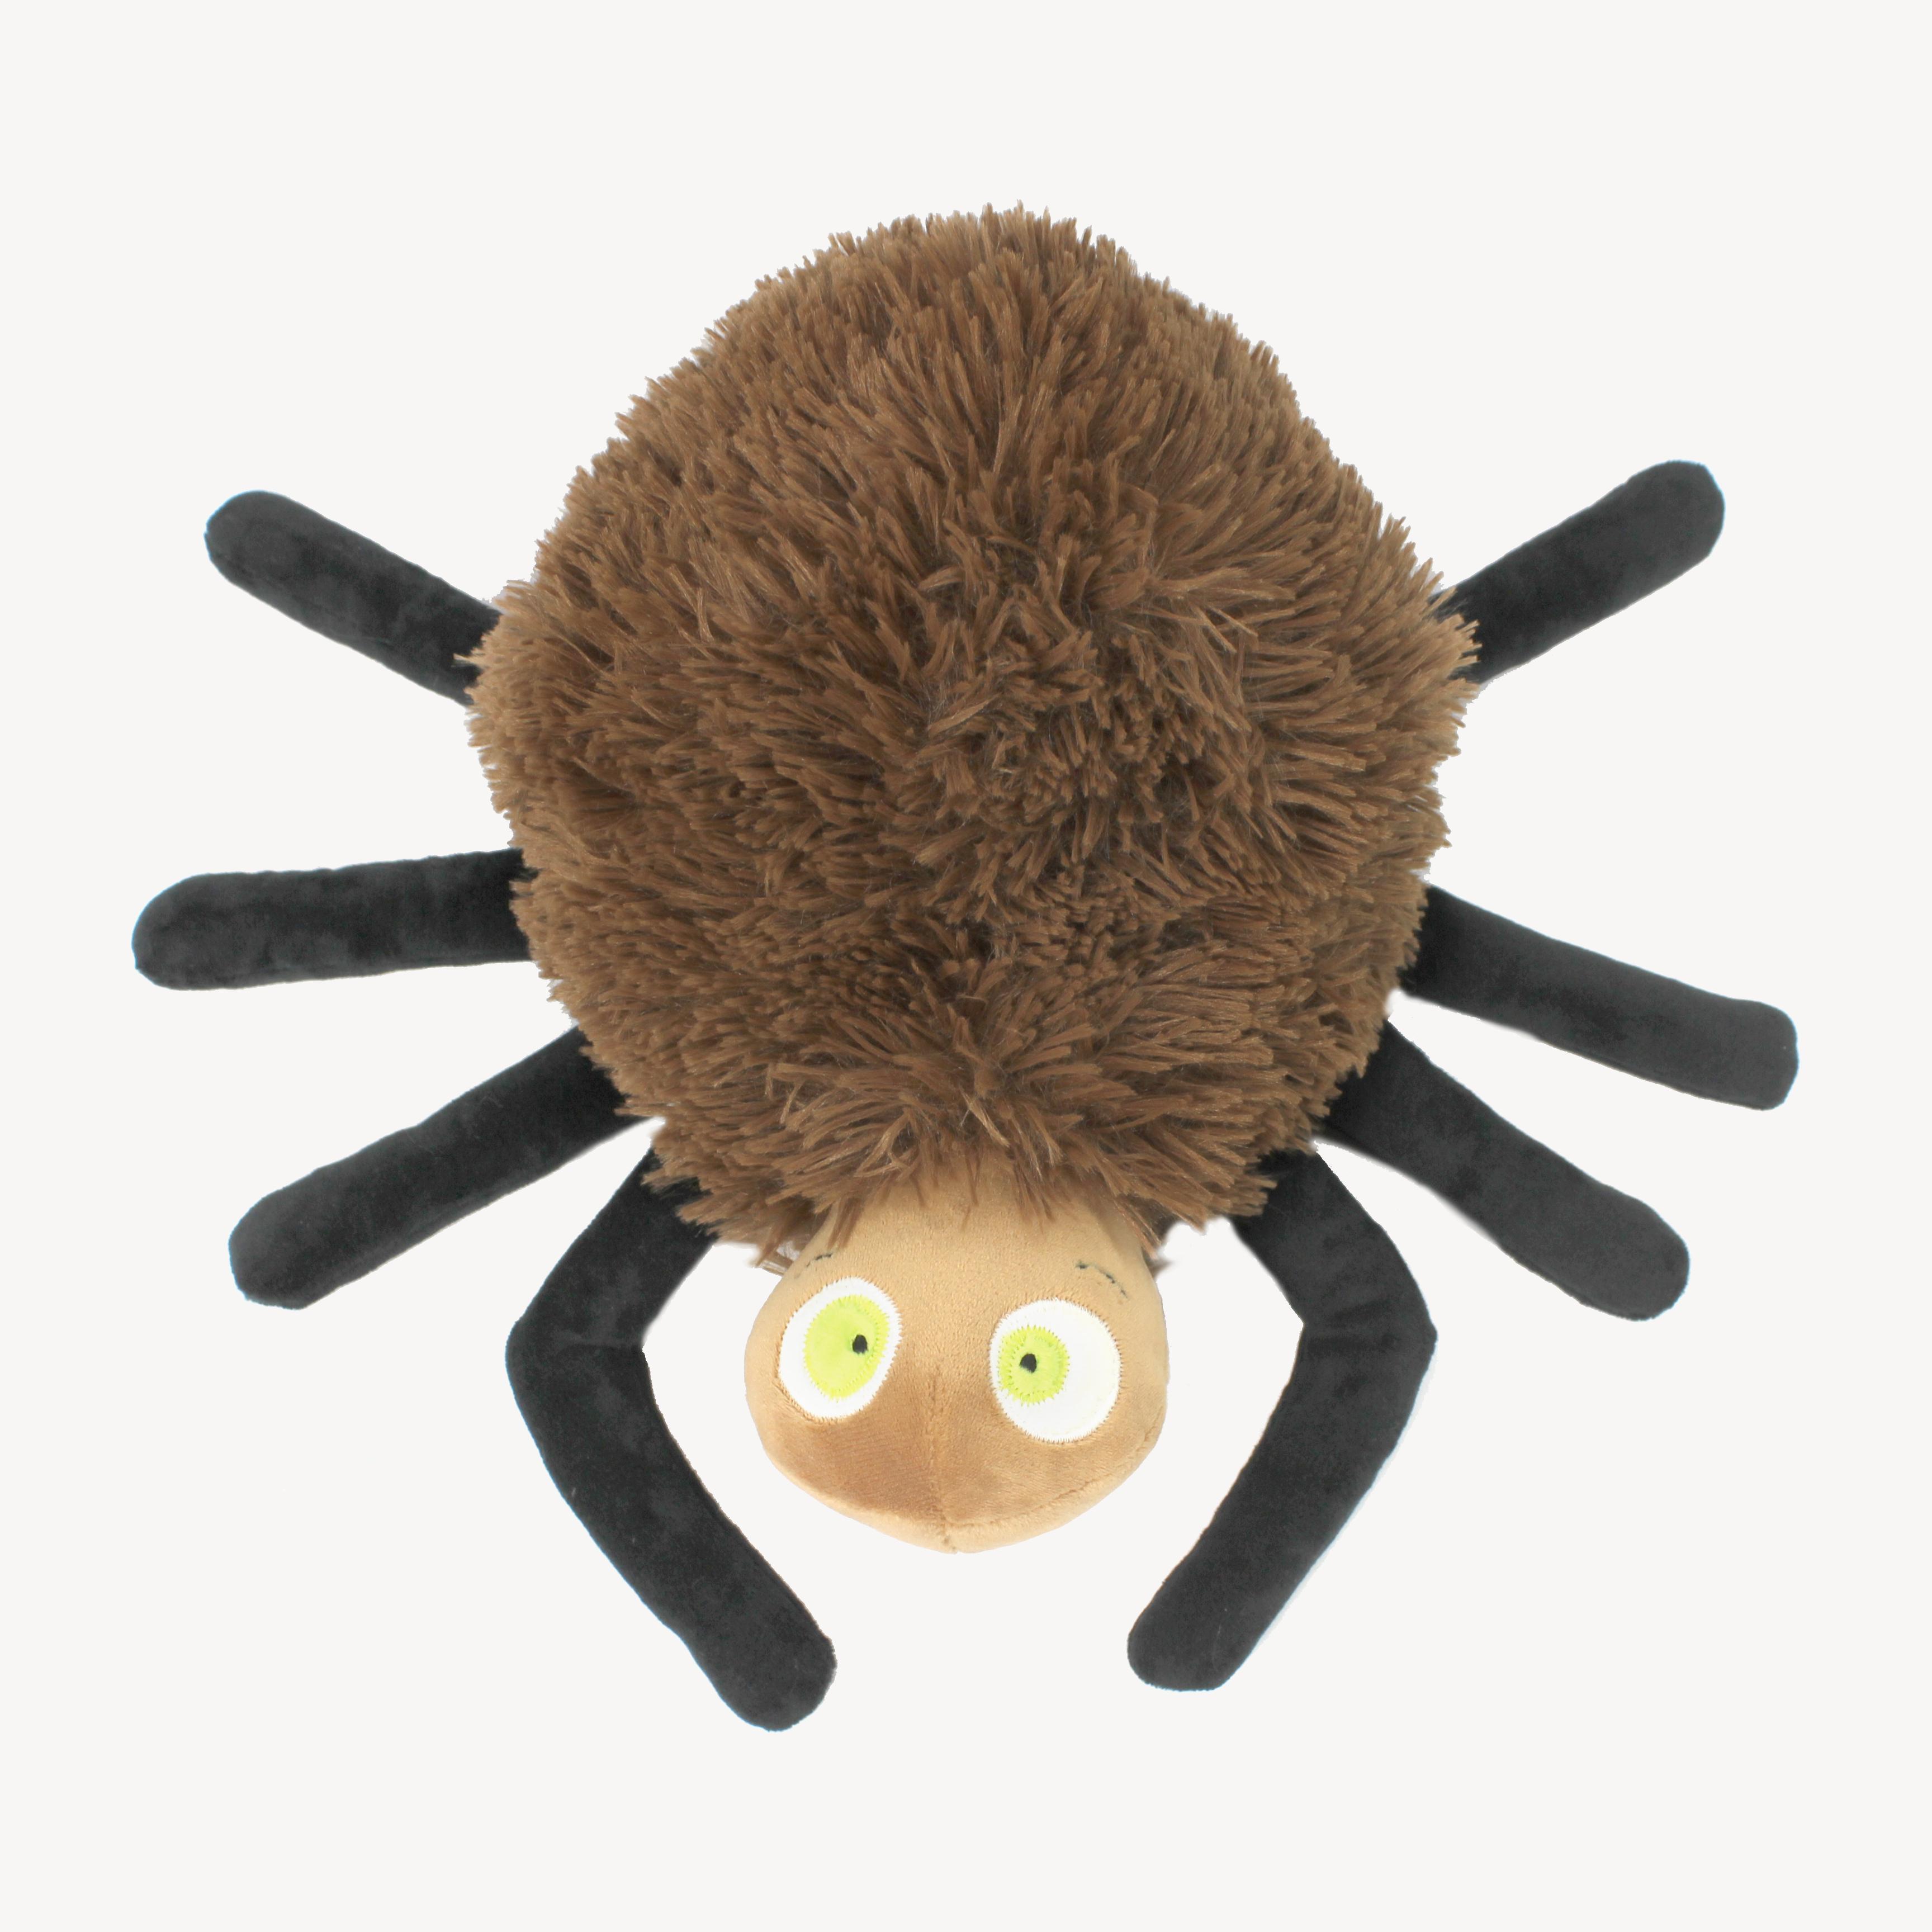 Spinne nähen: Schnittmuster \